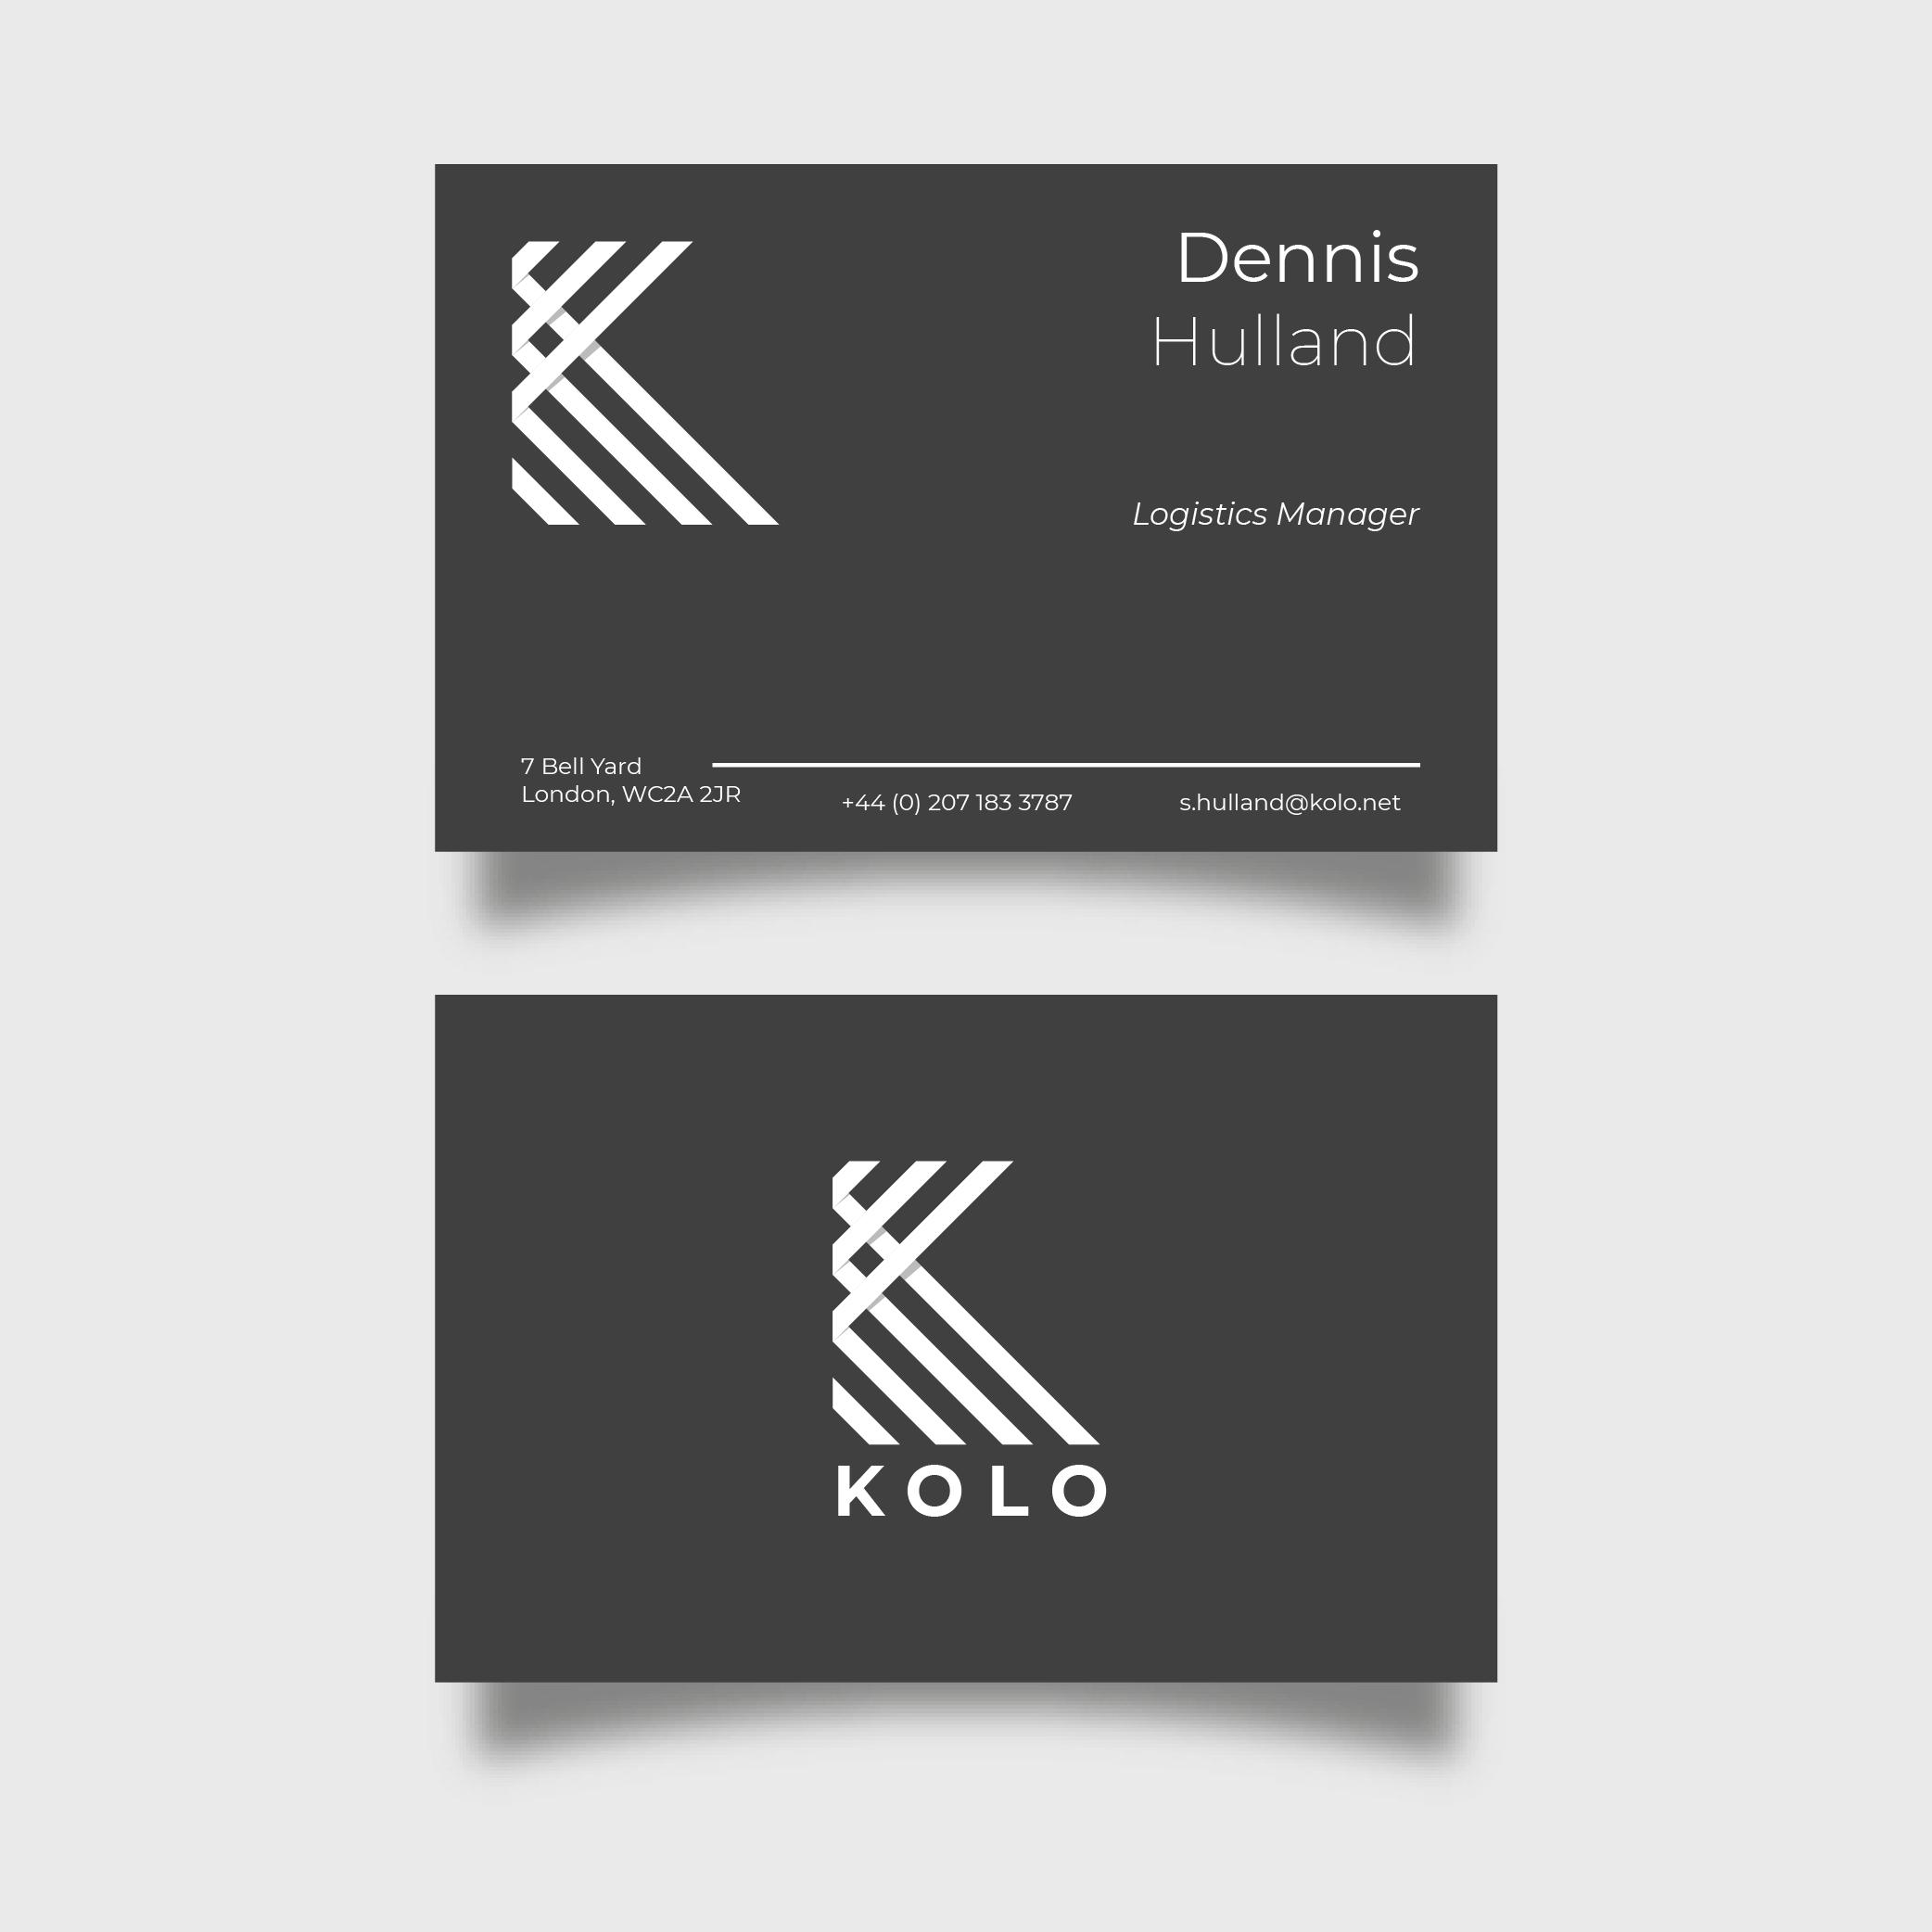 Kolo Cards 2 1